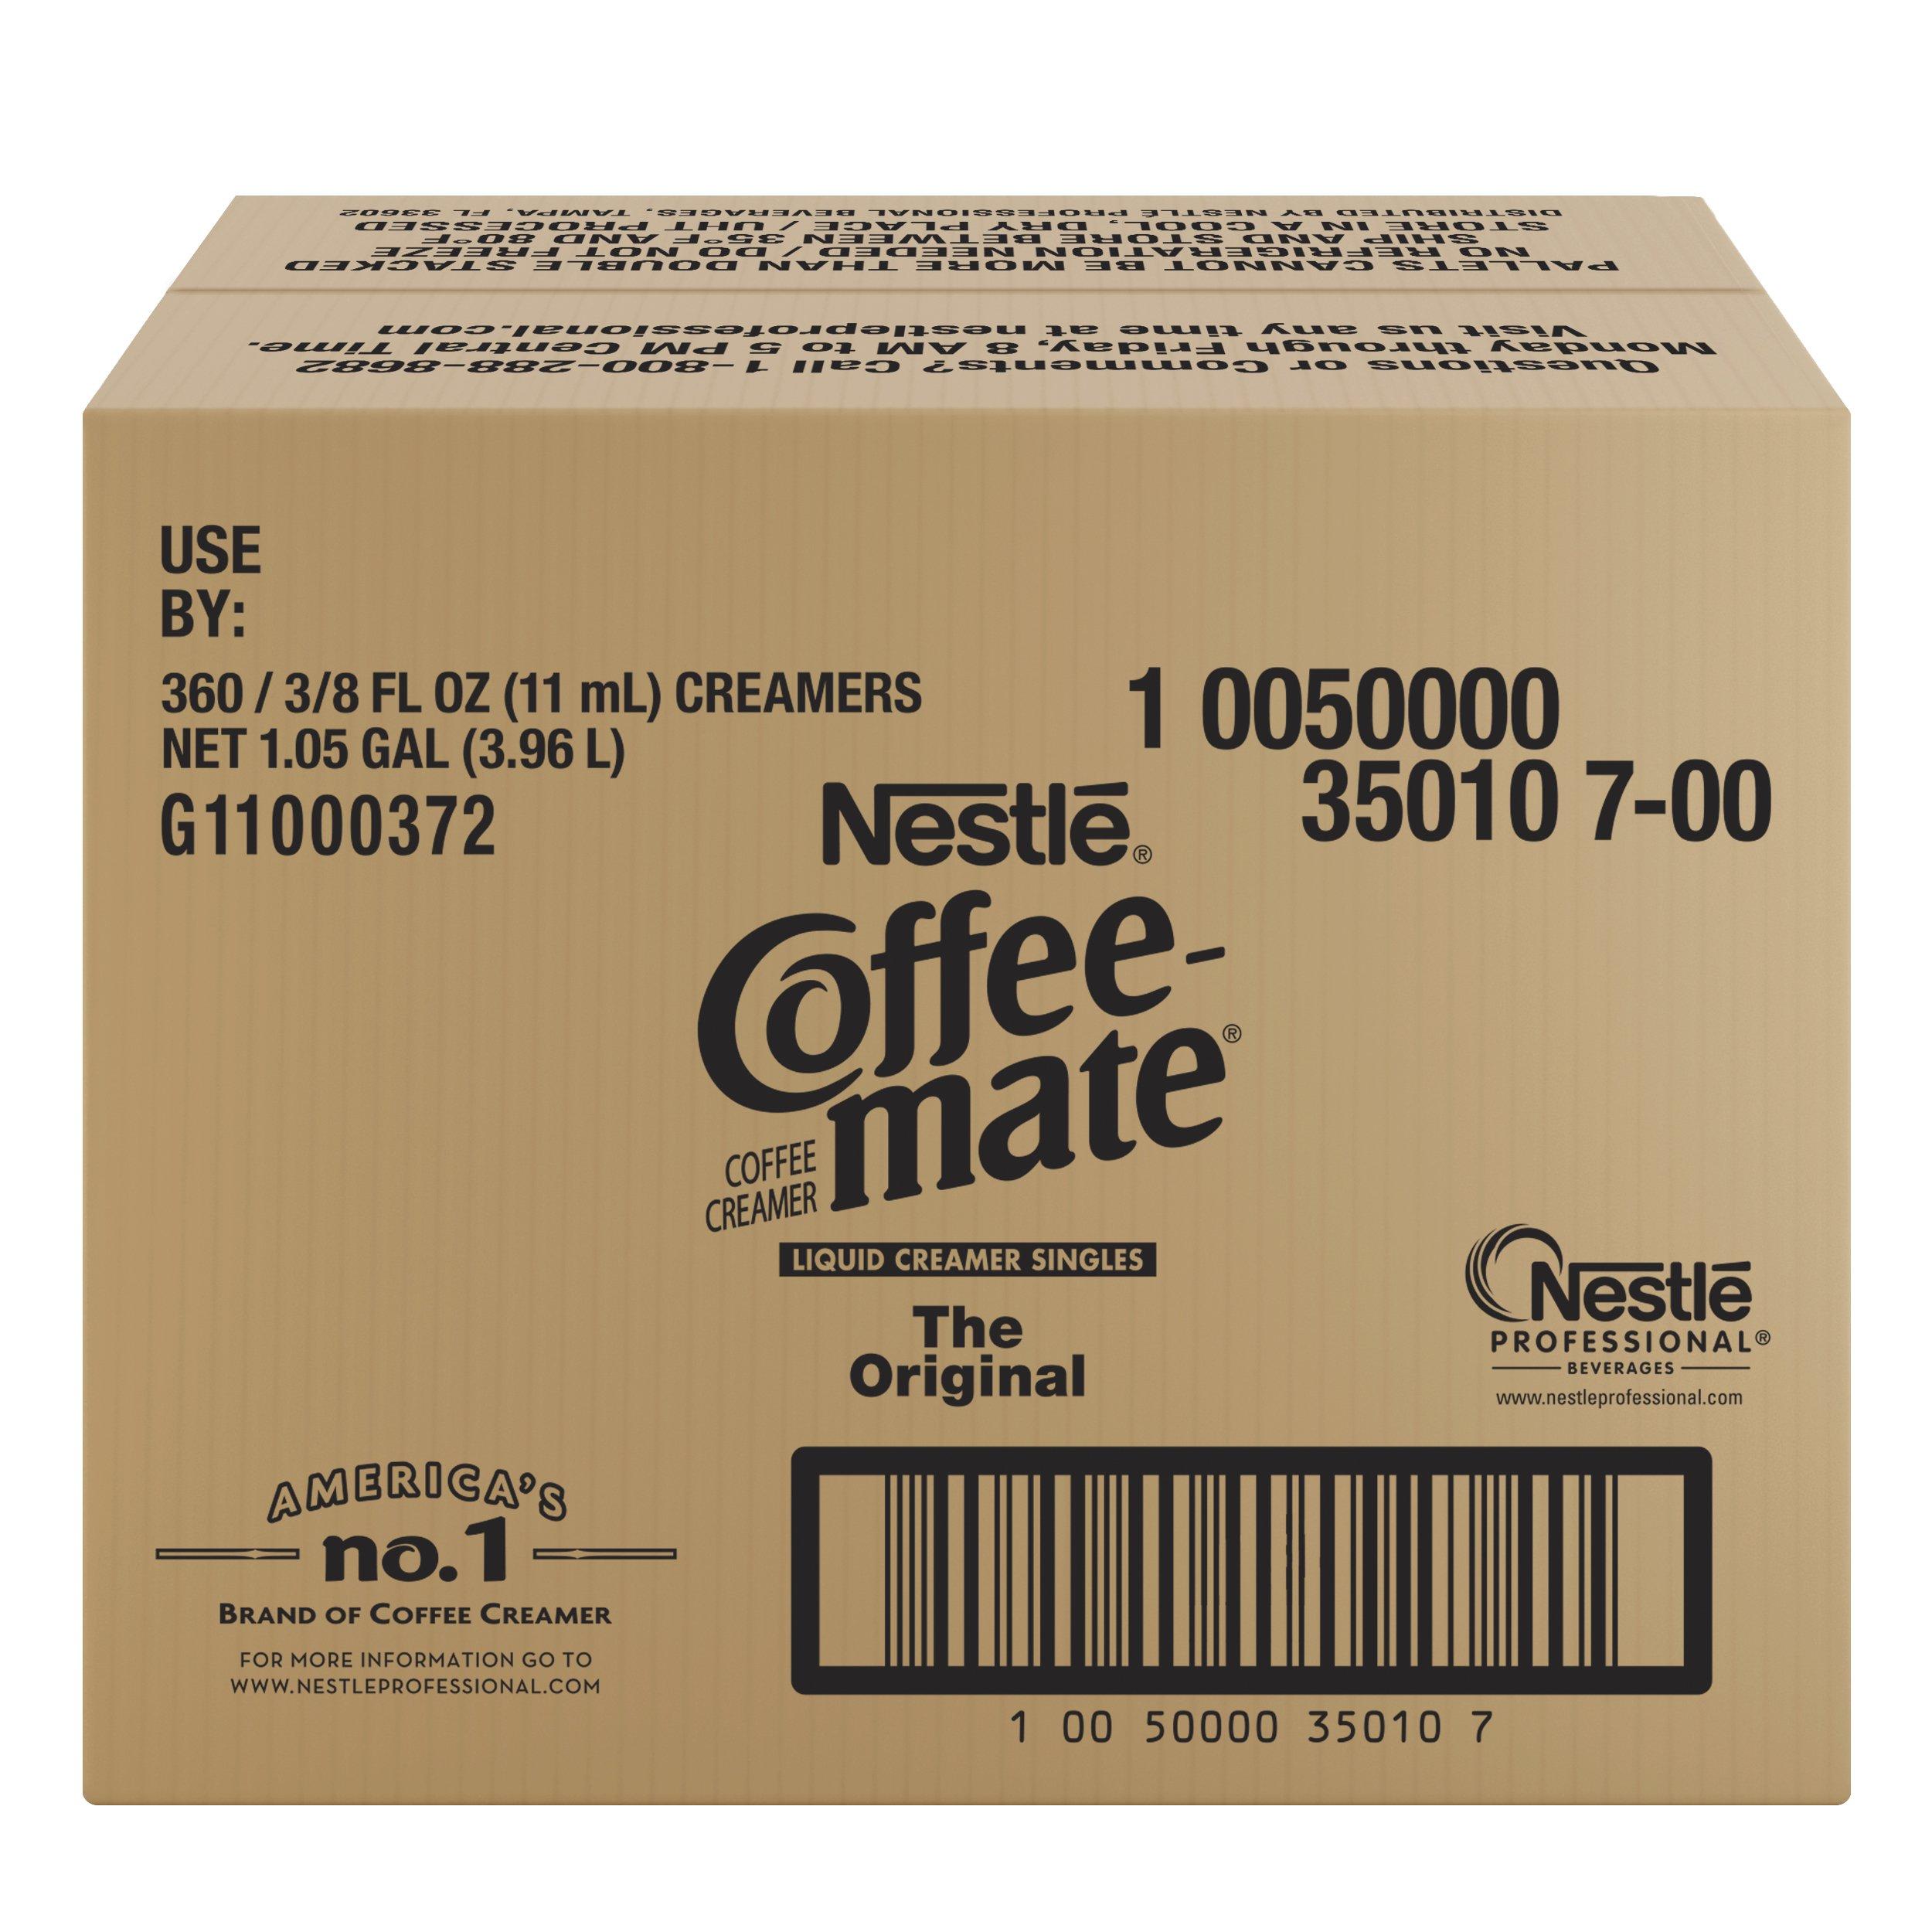 NESTLE COFFEE-MATE Coffee Creamer, Original, liquid creamer singles, 360 Count (Pack of 1) by Nestle Coffee Mate (Image #5)